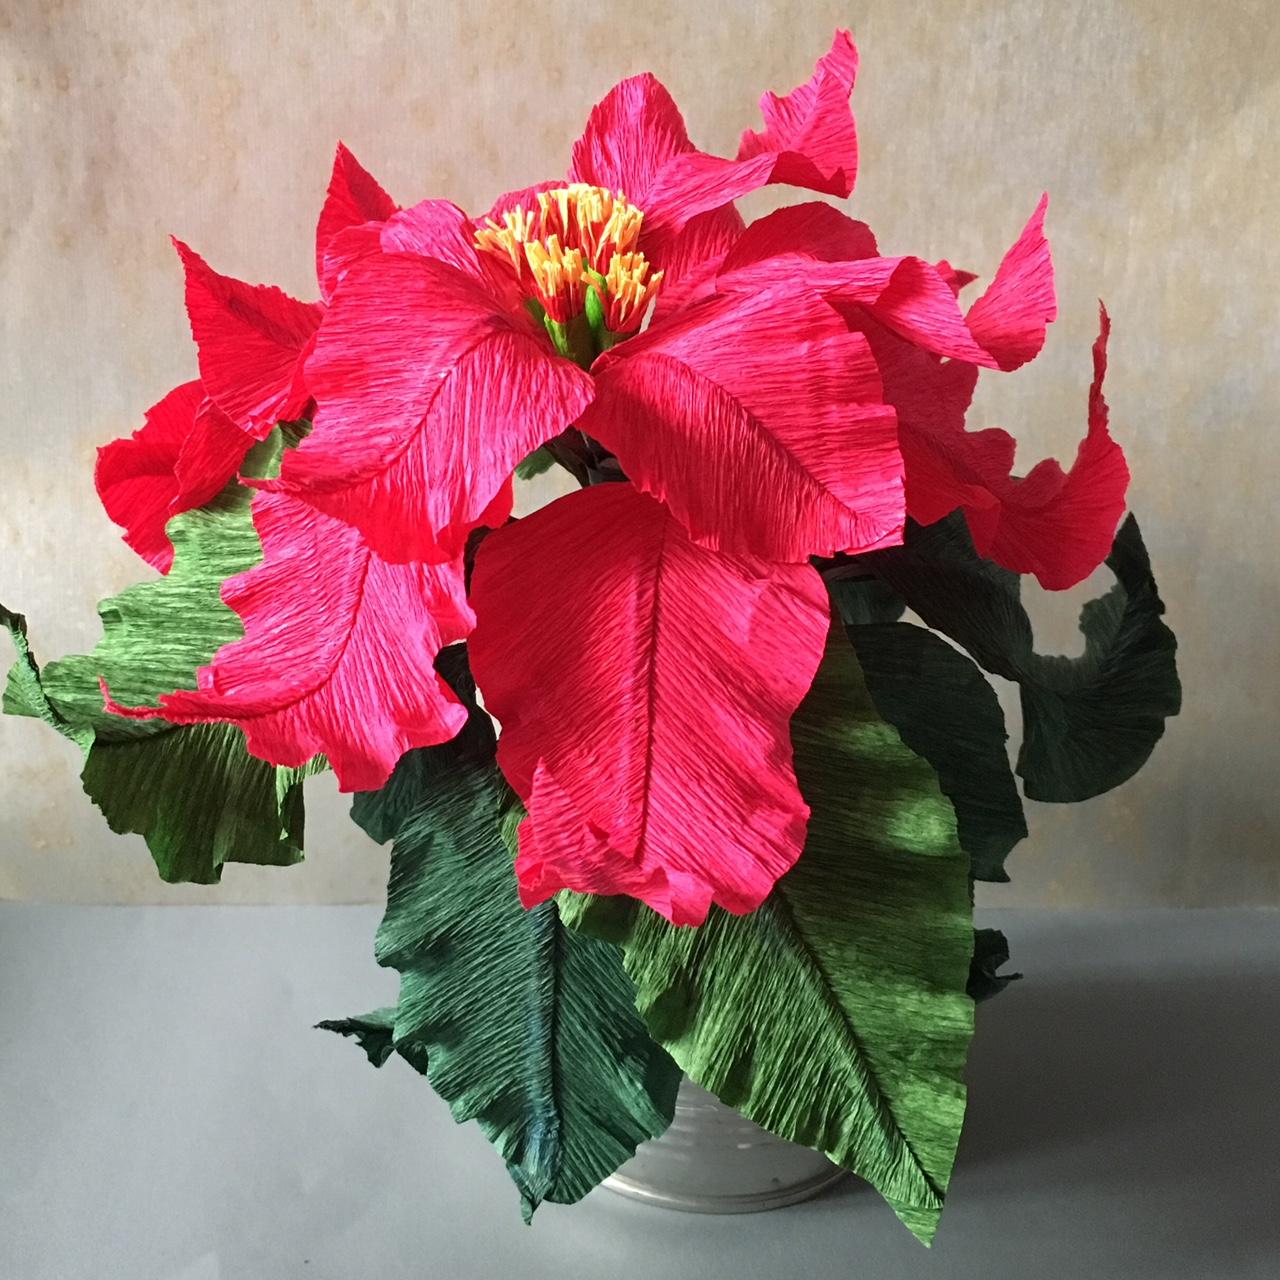 crepe paper Poinsettia for Christmas gift